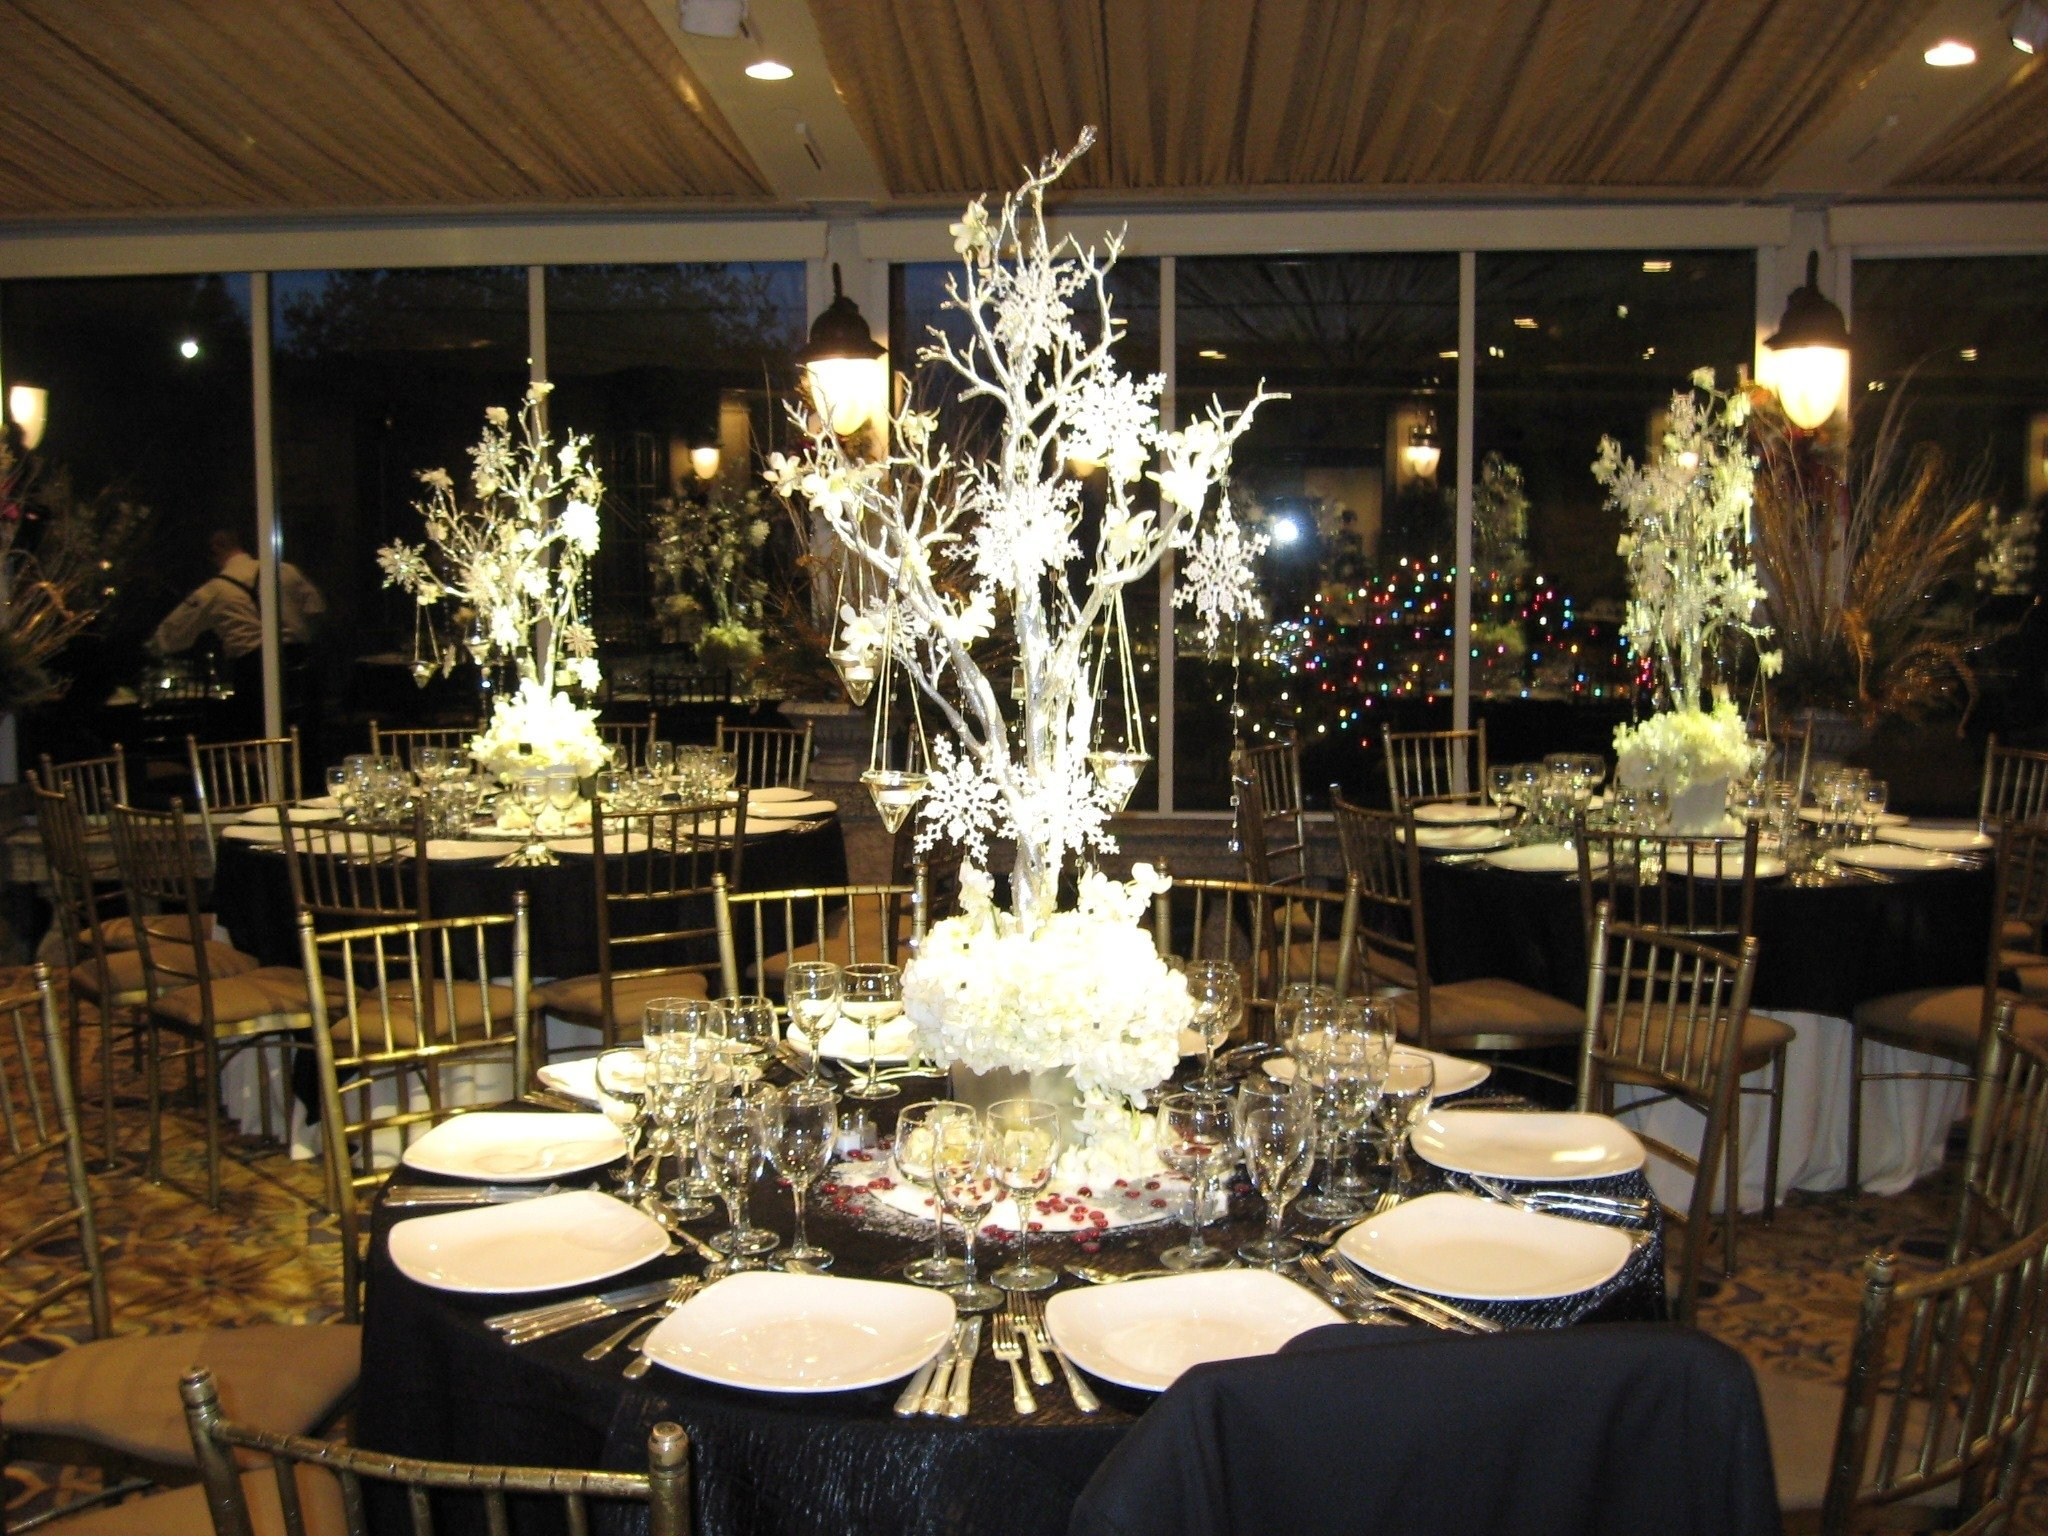 10 Lovable Ideas For Wedding Centerpieces On A Budget gallery of tips in wedding centerpieces on a budget margusriga baby 2021